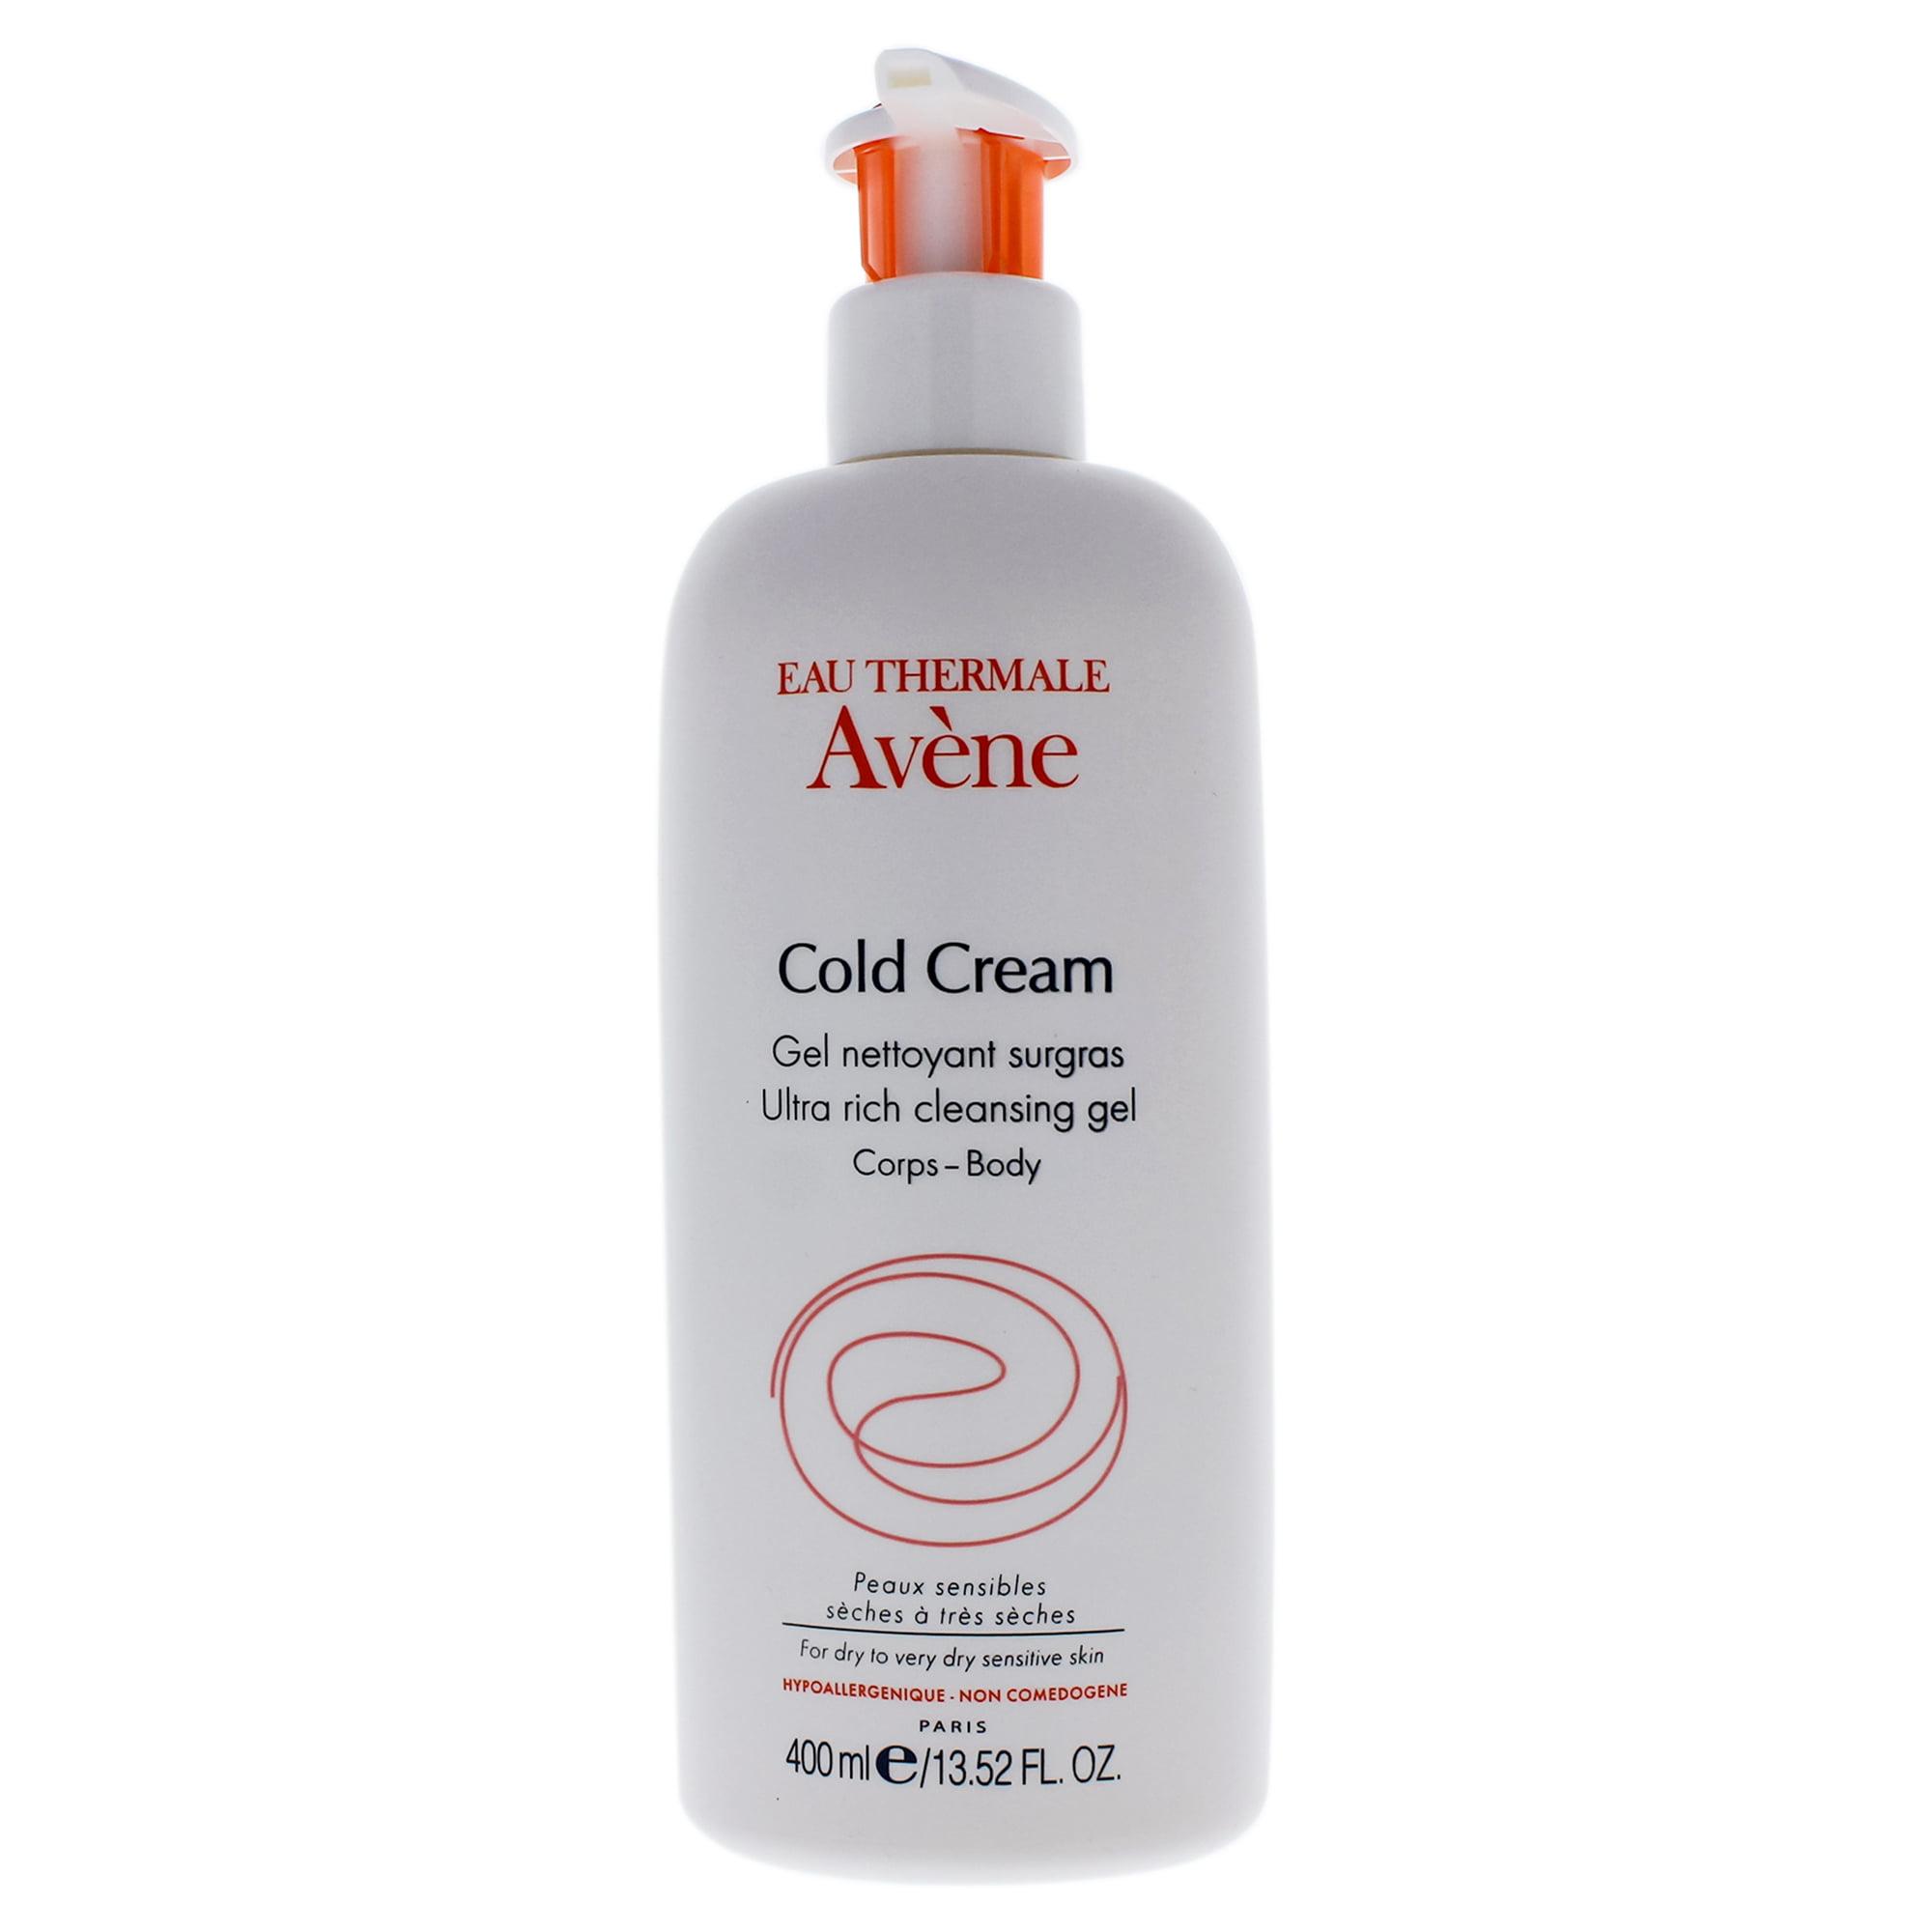 avene cold cream face review